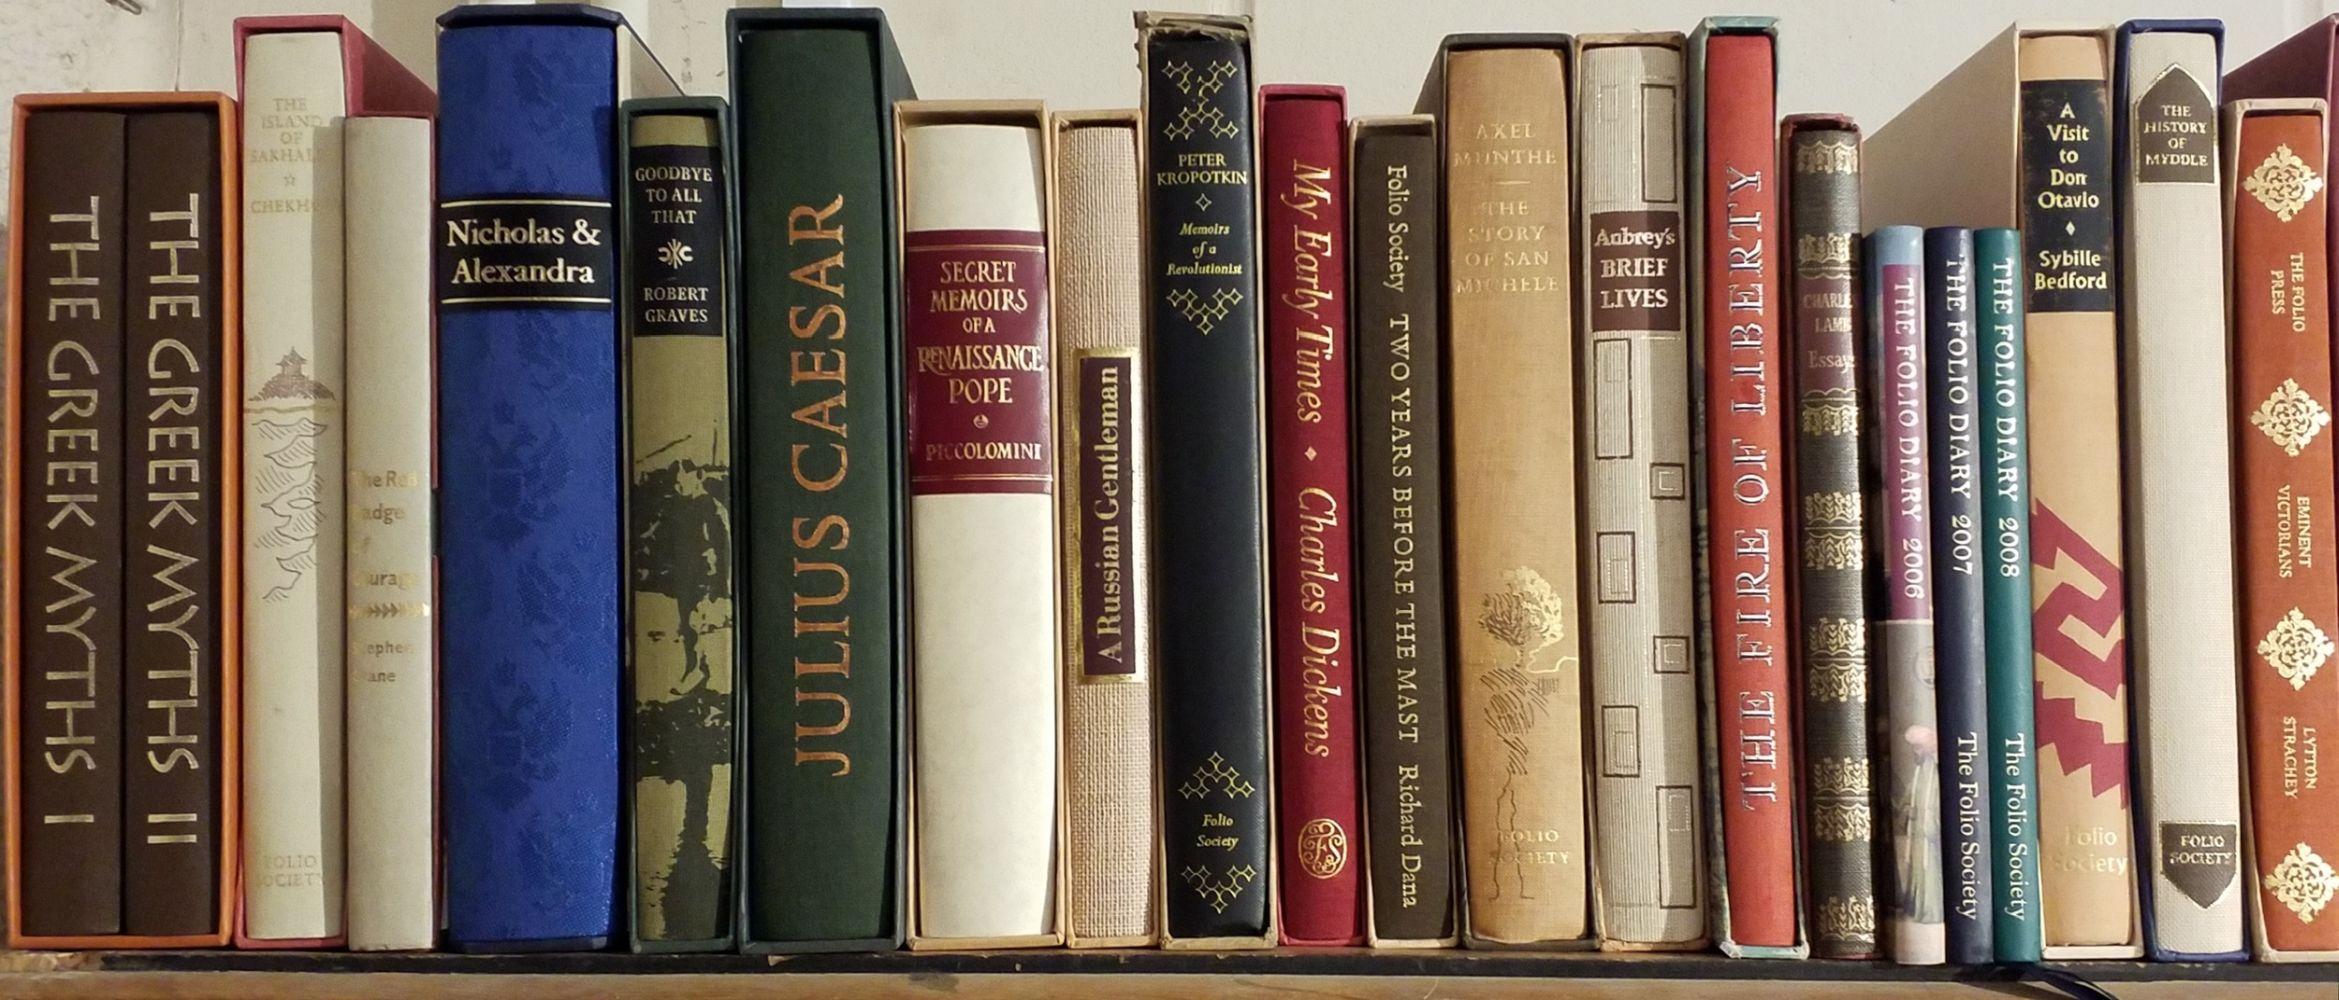 Folio Society. 78 volumes - Image 3 of 4